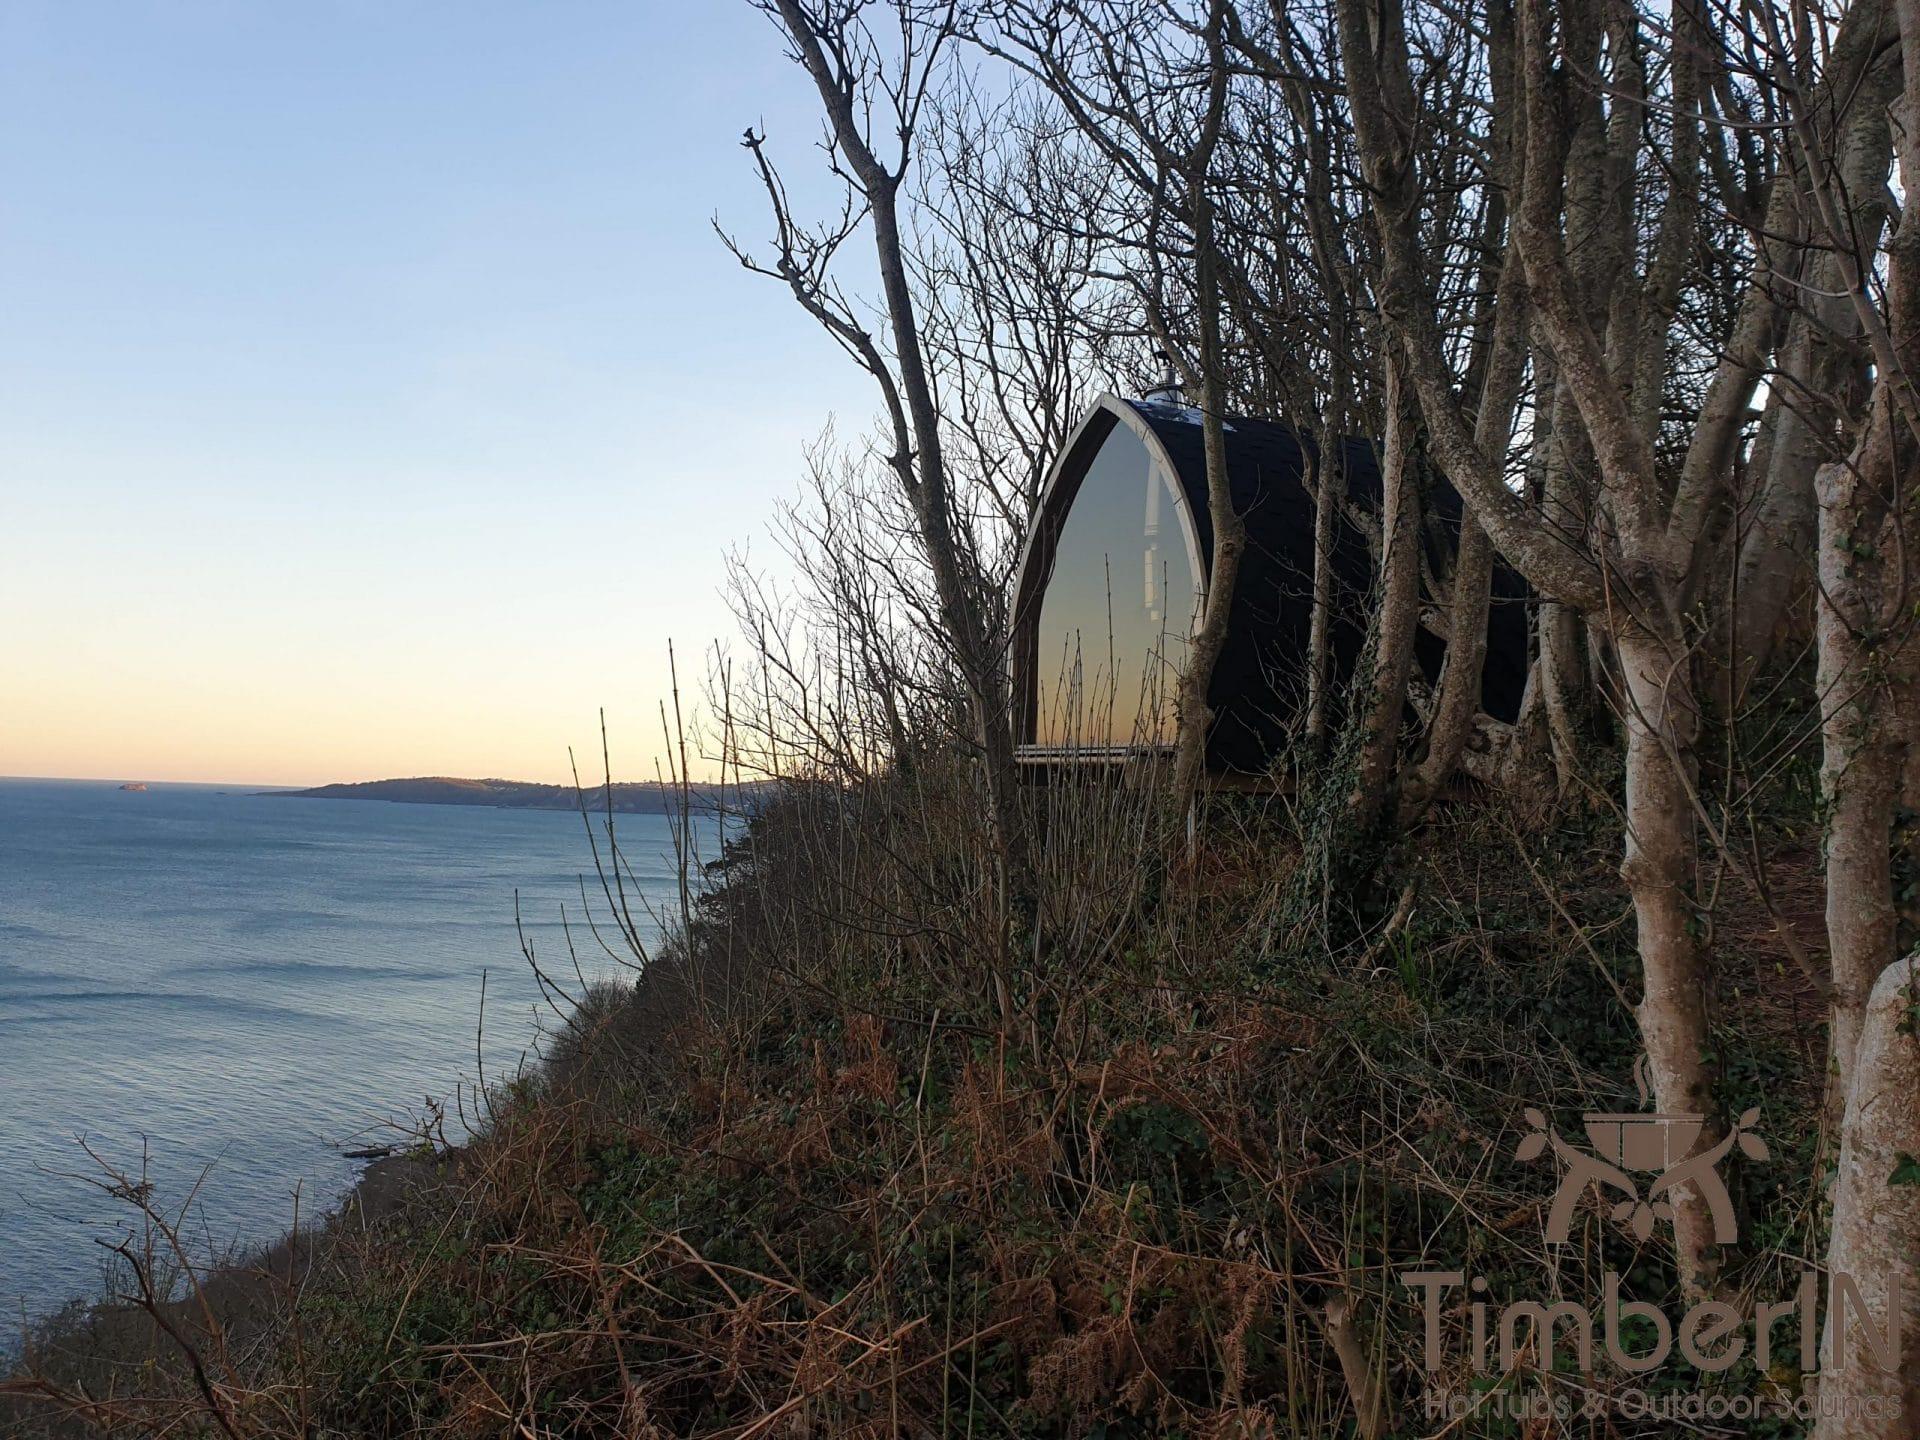 Outdoor Garden Sauna Igloo Design Robert Shaldon United Kingdom 1 1 scaled